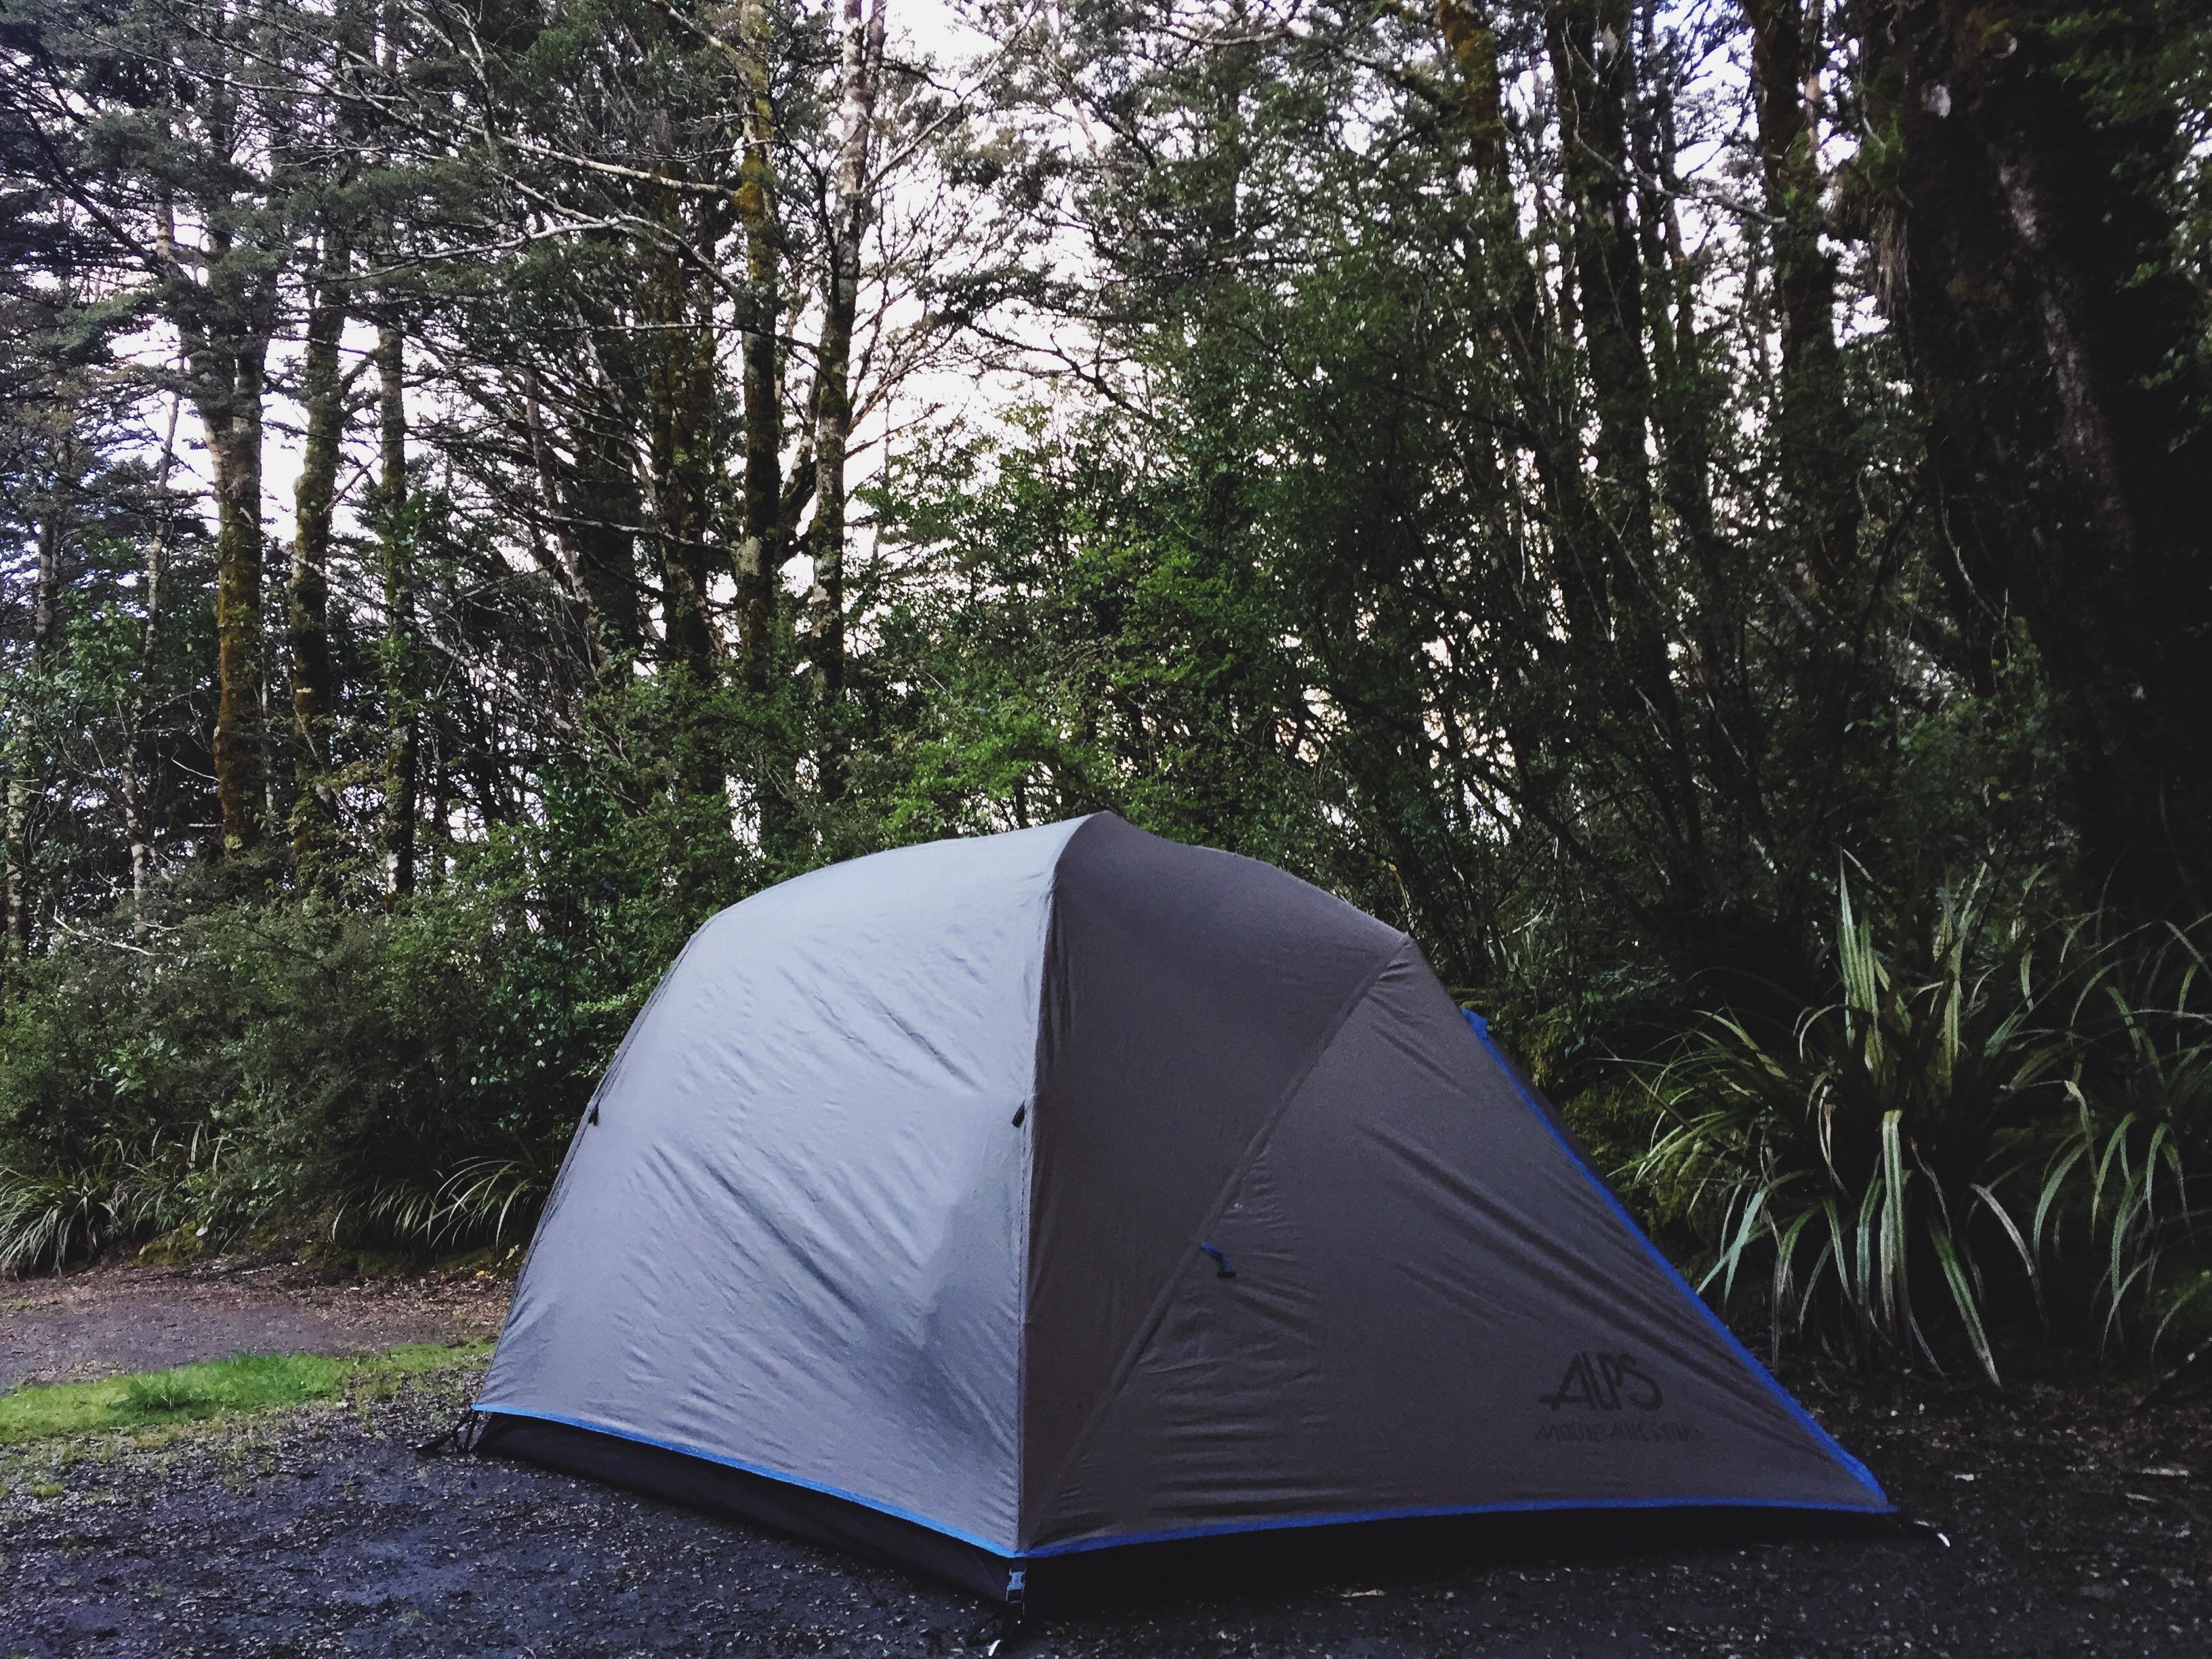 Campsite at Whakapapa Village